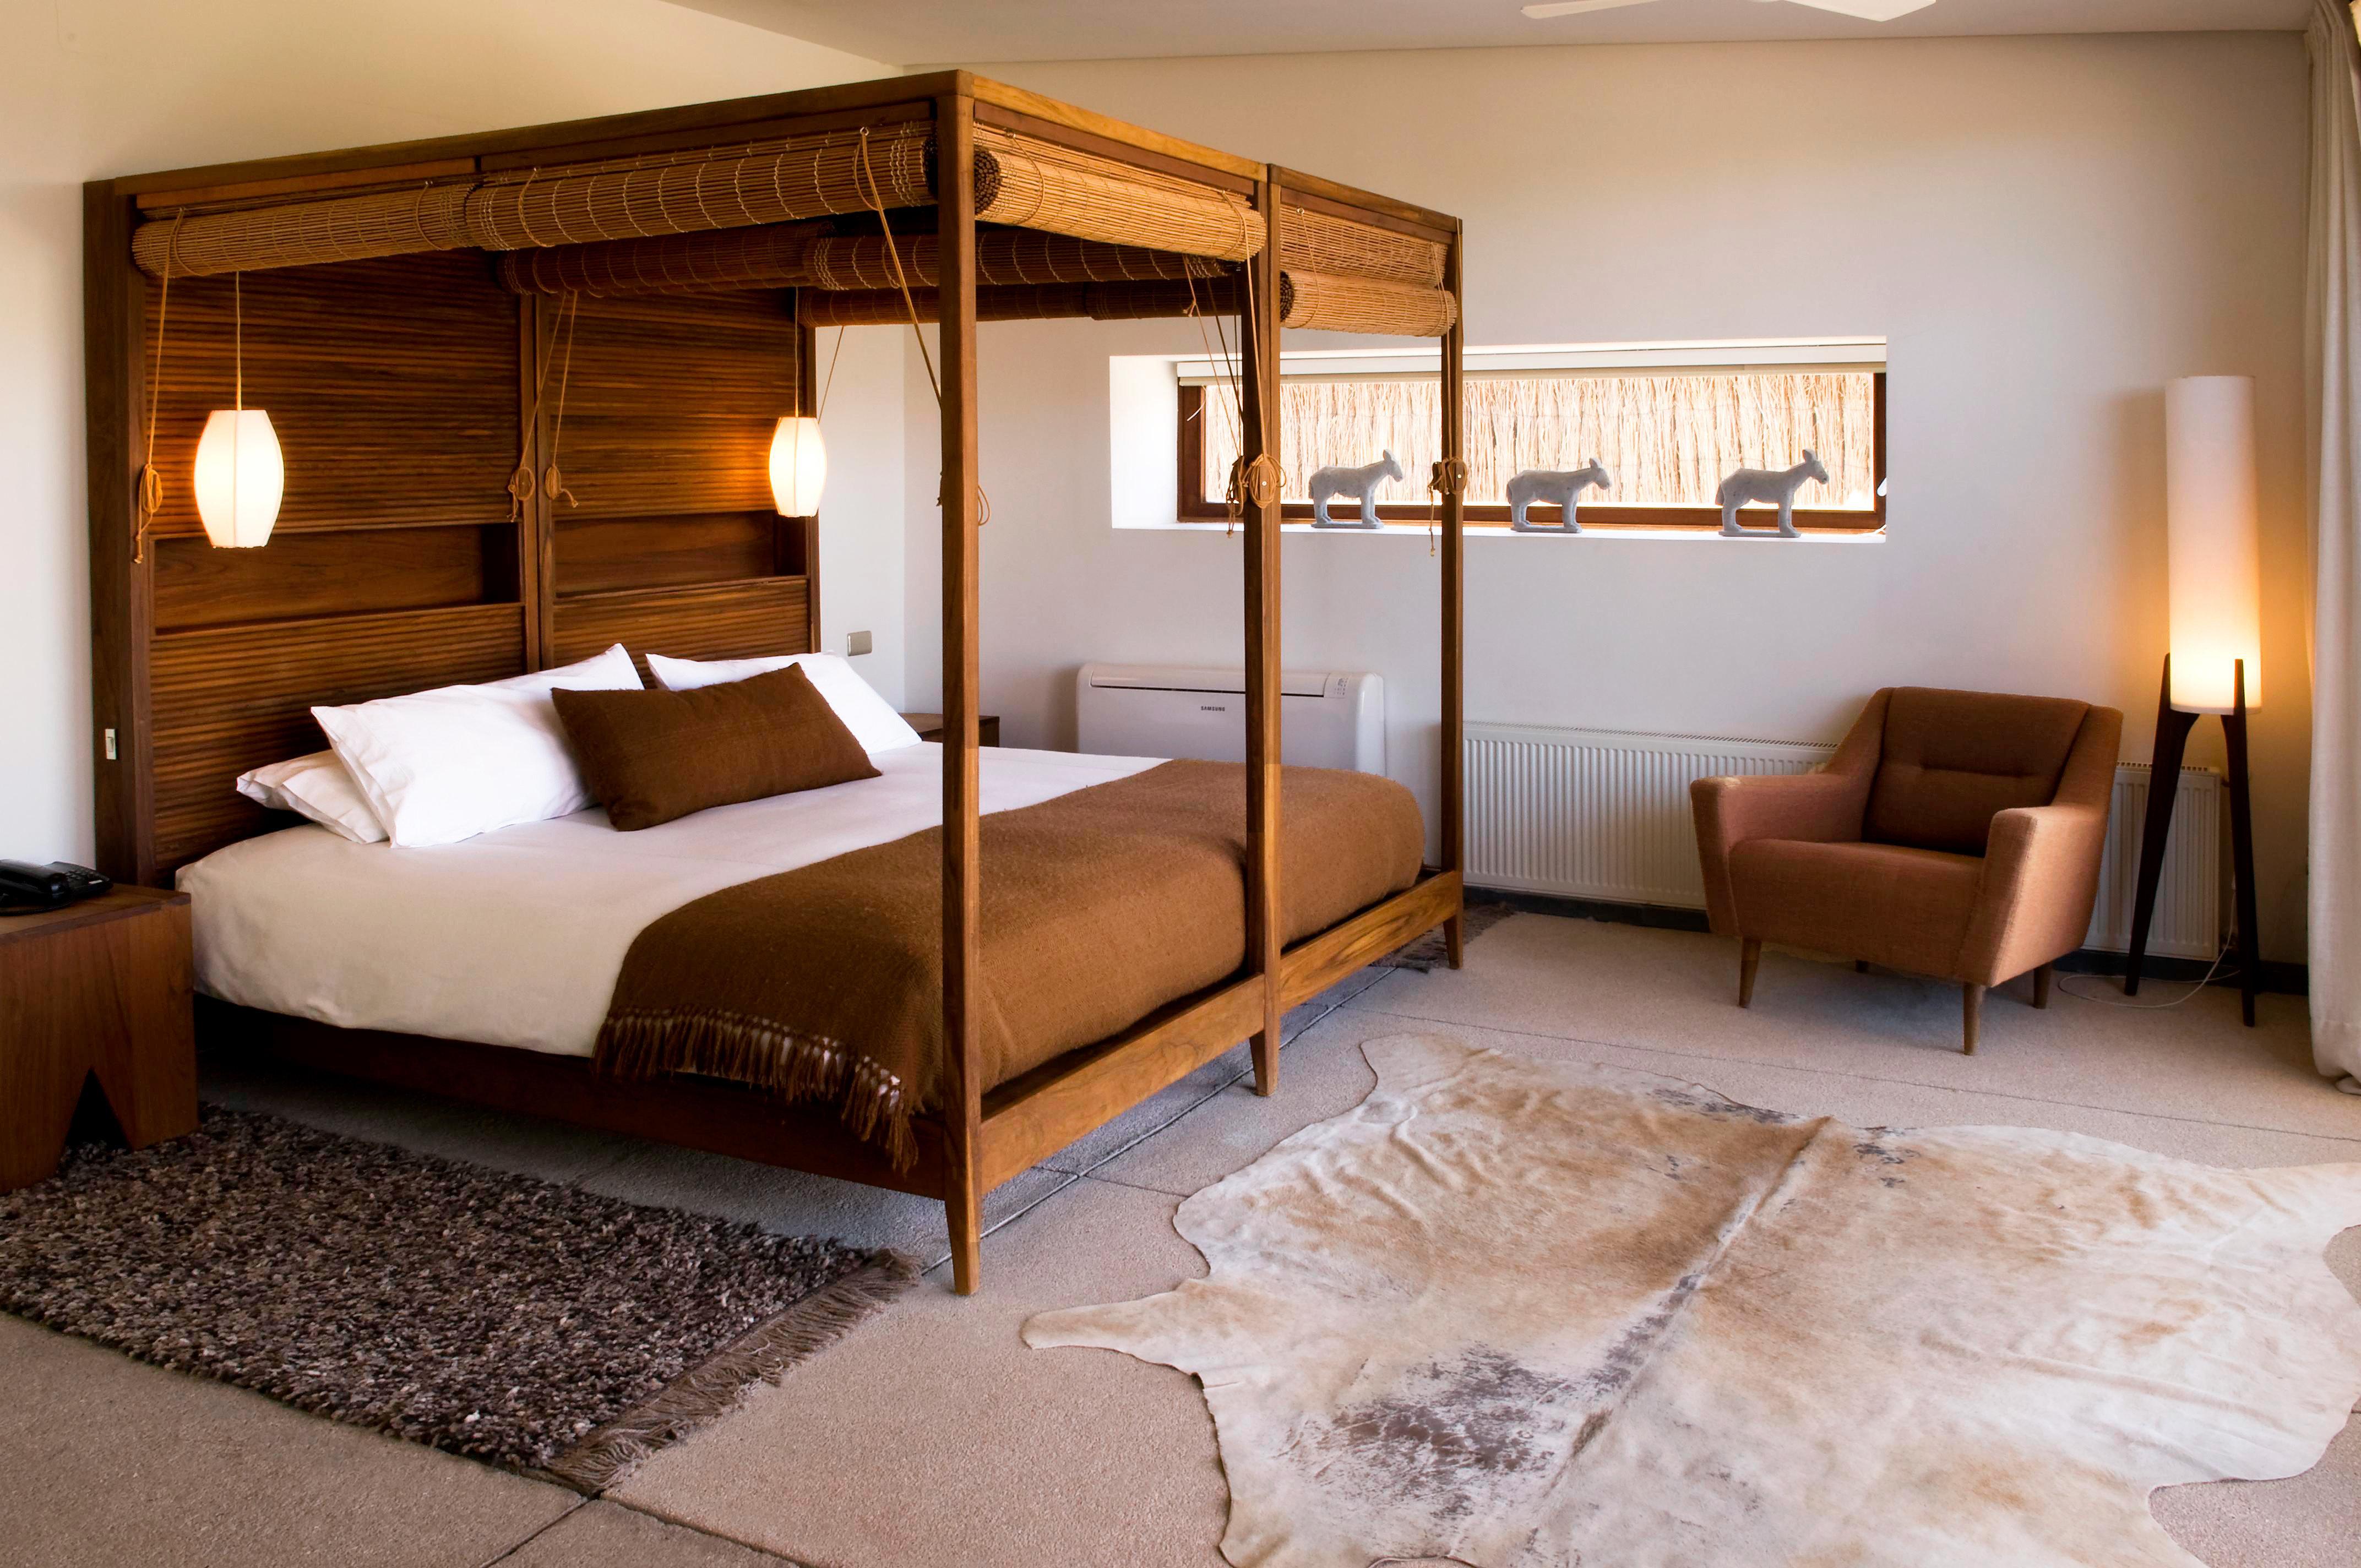 Bedroom Country Hip Luxury Suite property living room home hardwood cottage Villa bed frame